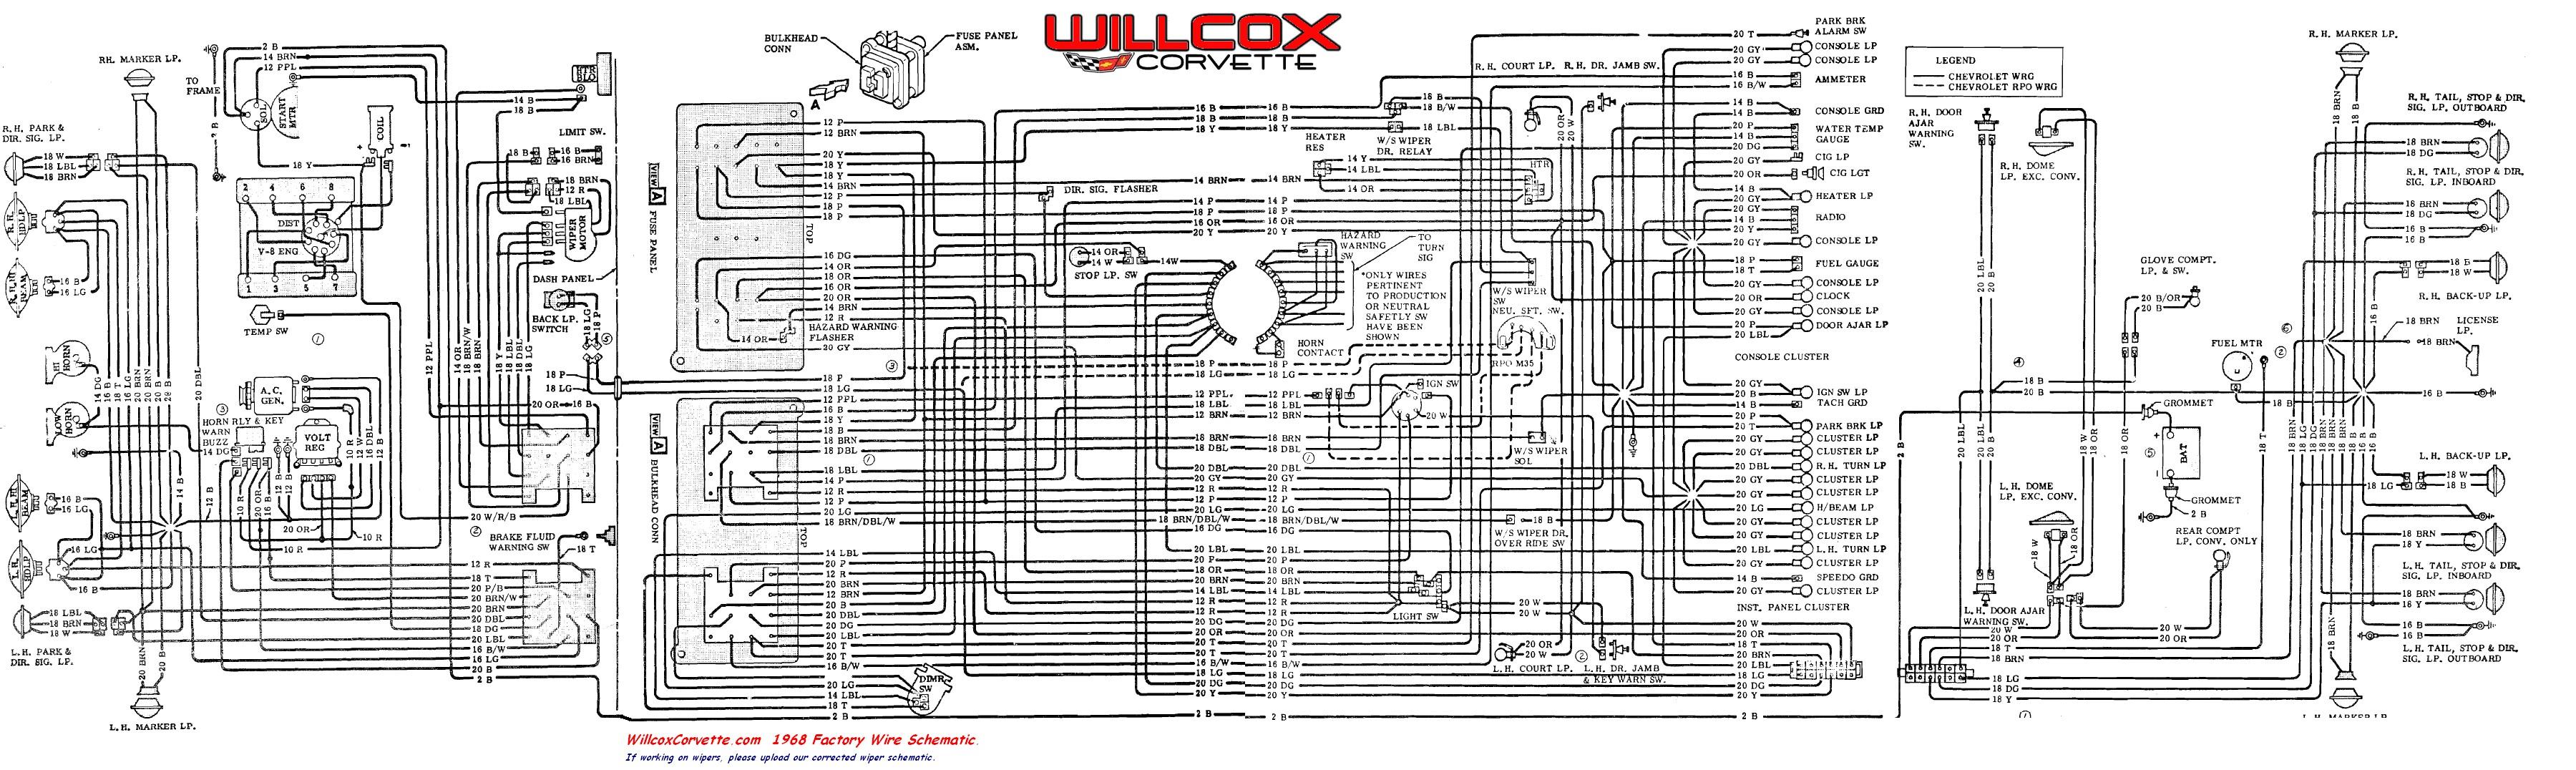 1981 corvette wiring schematic example electrical wiring diagram u2022 rh huntervalleyhotels co 1956 Chevy Truck Wiring Diagram 1979 Corvette Wiring Schematic